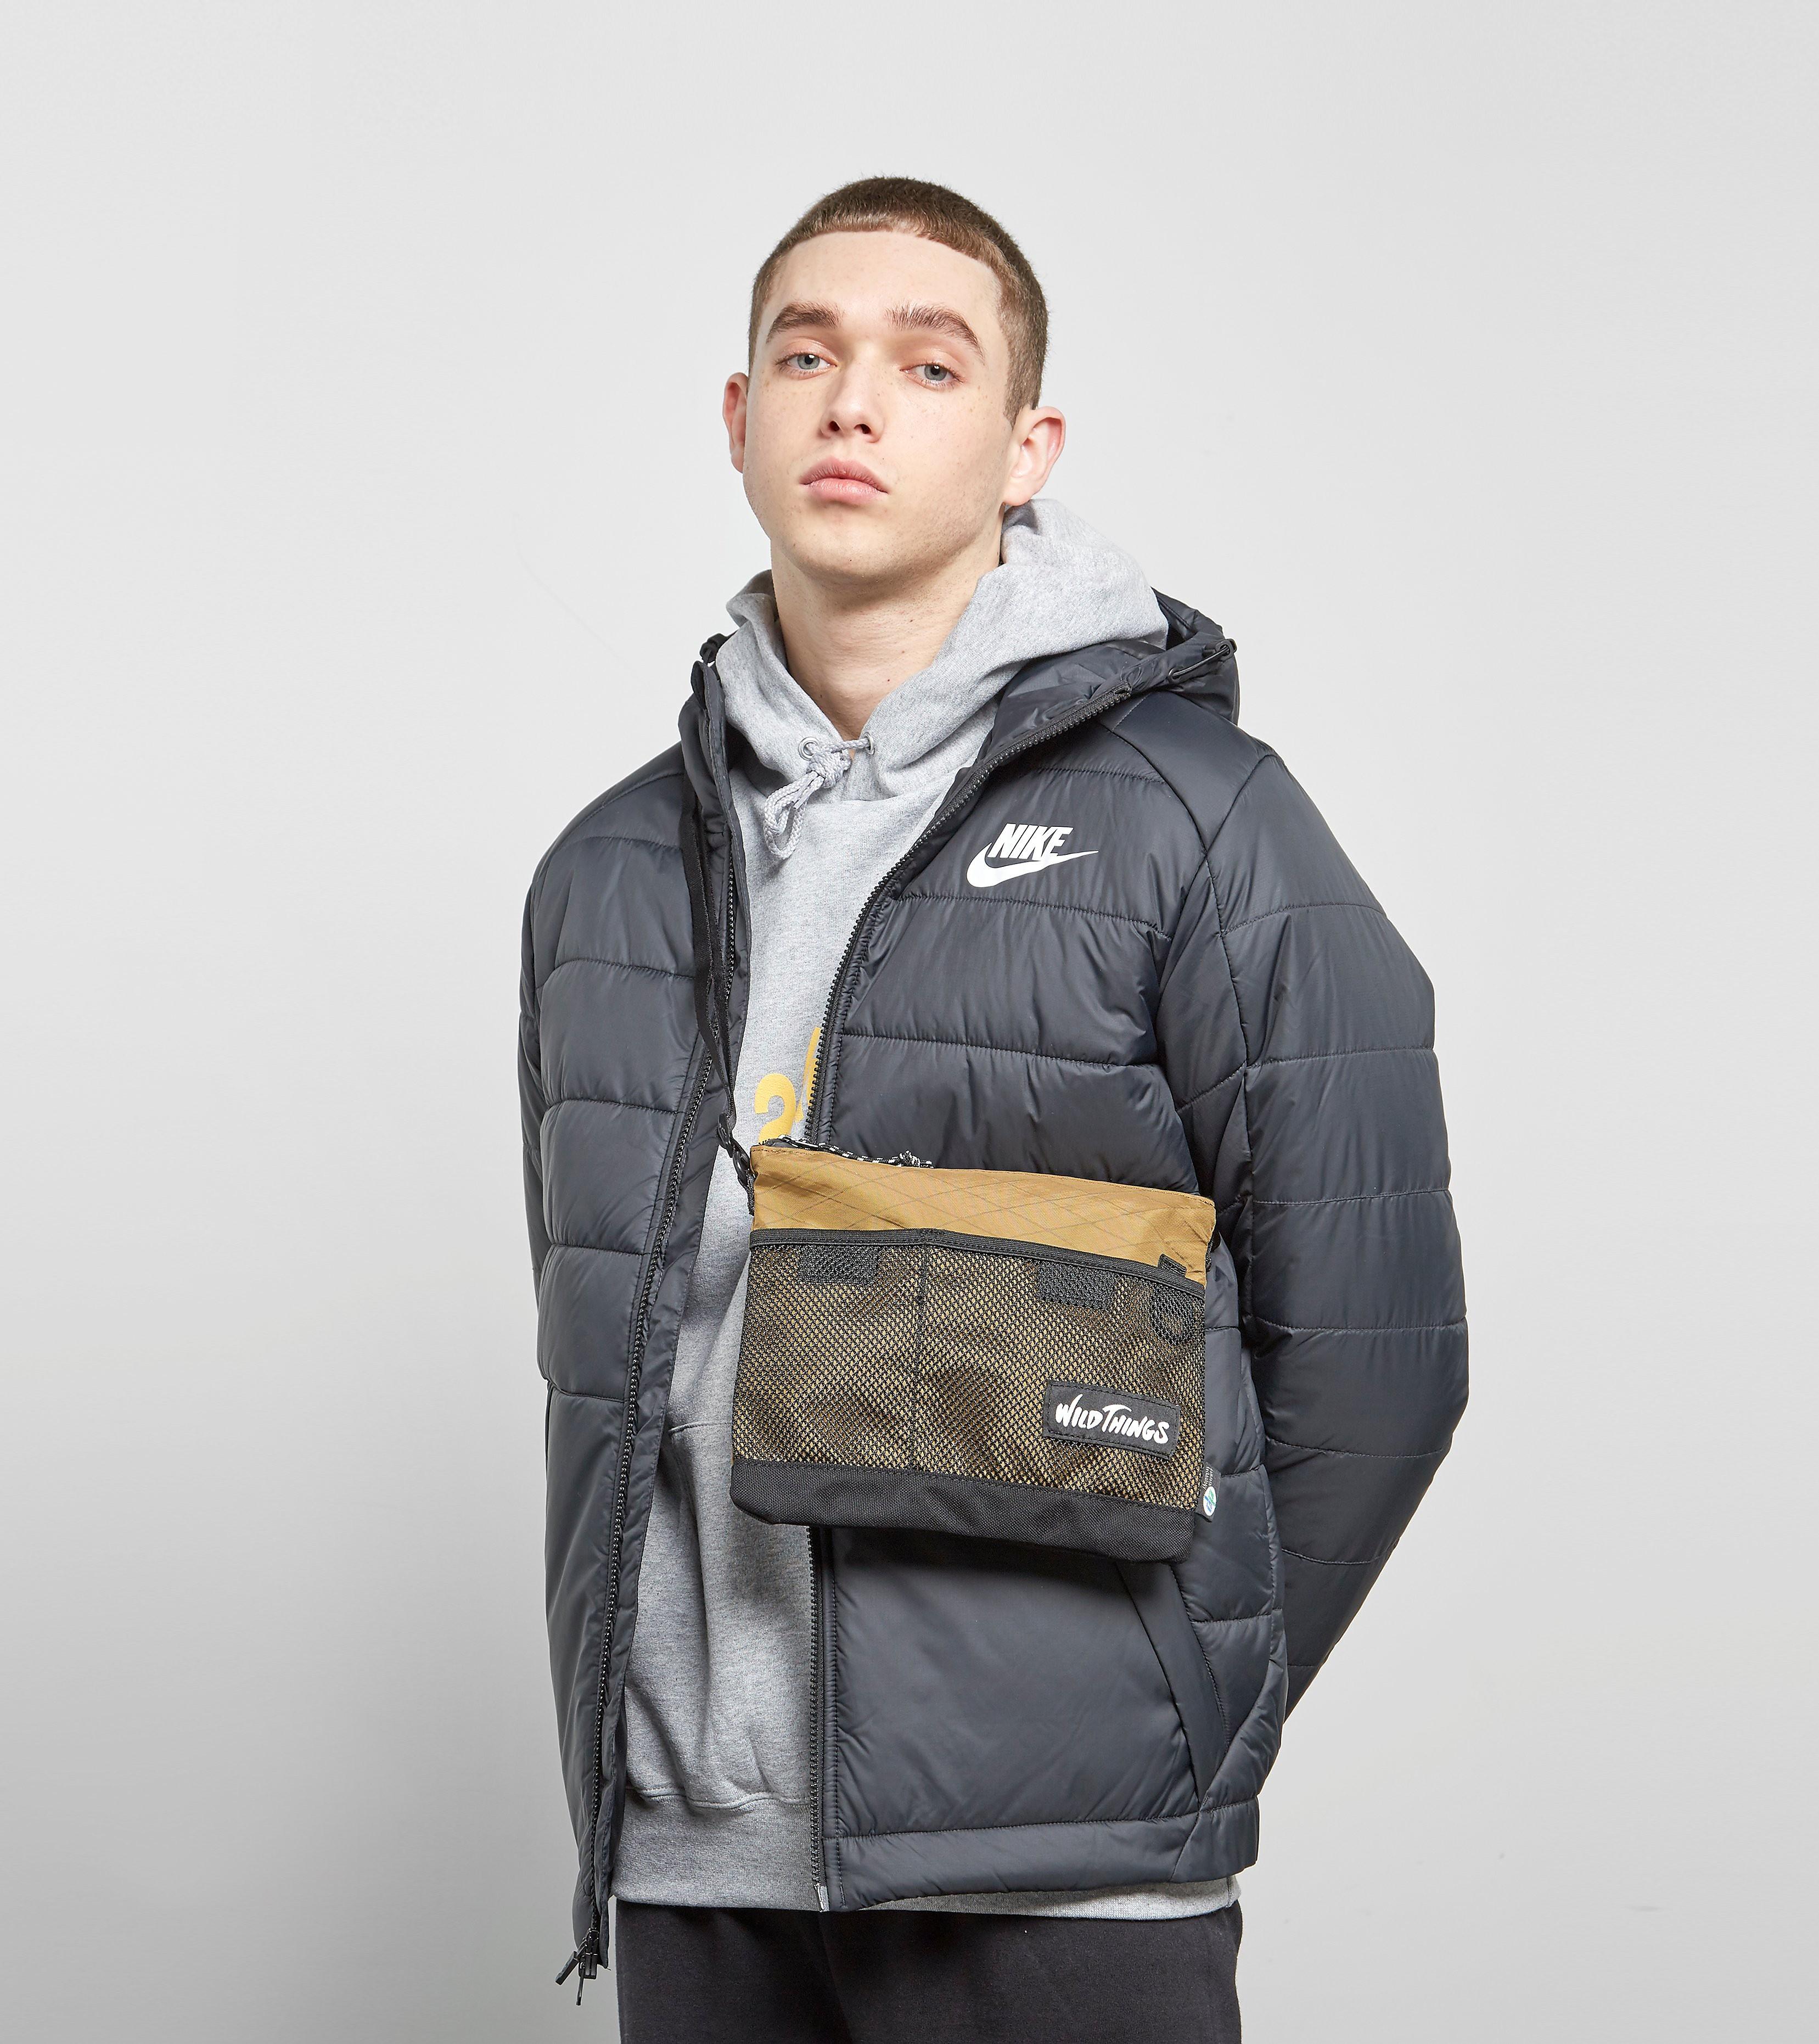 Wild Things Sacoche Bag, marrón/negro